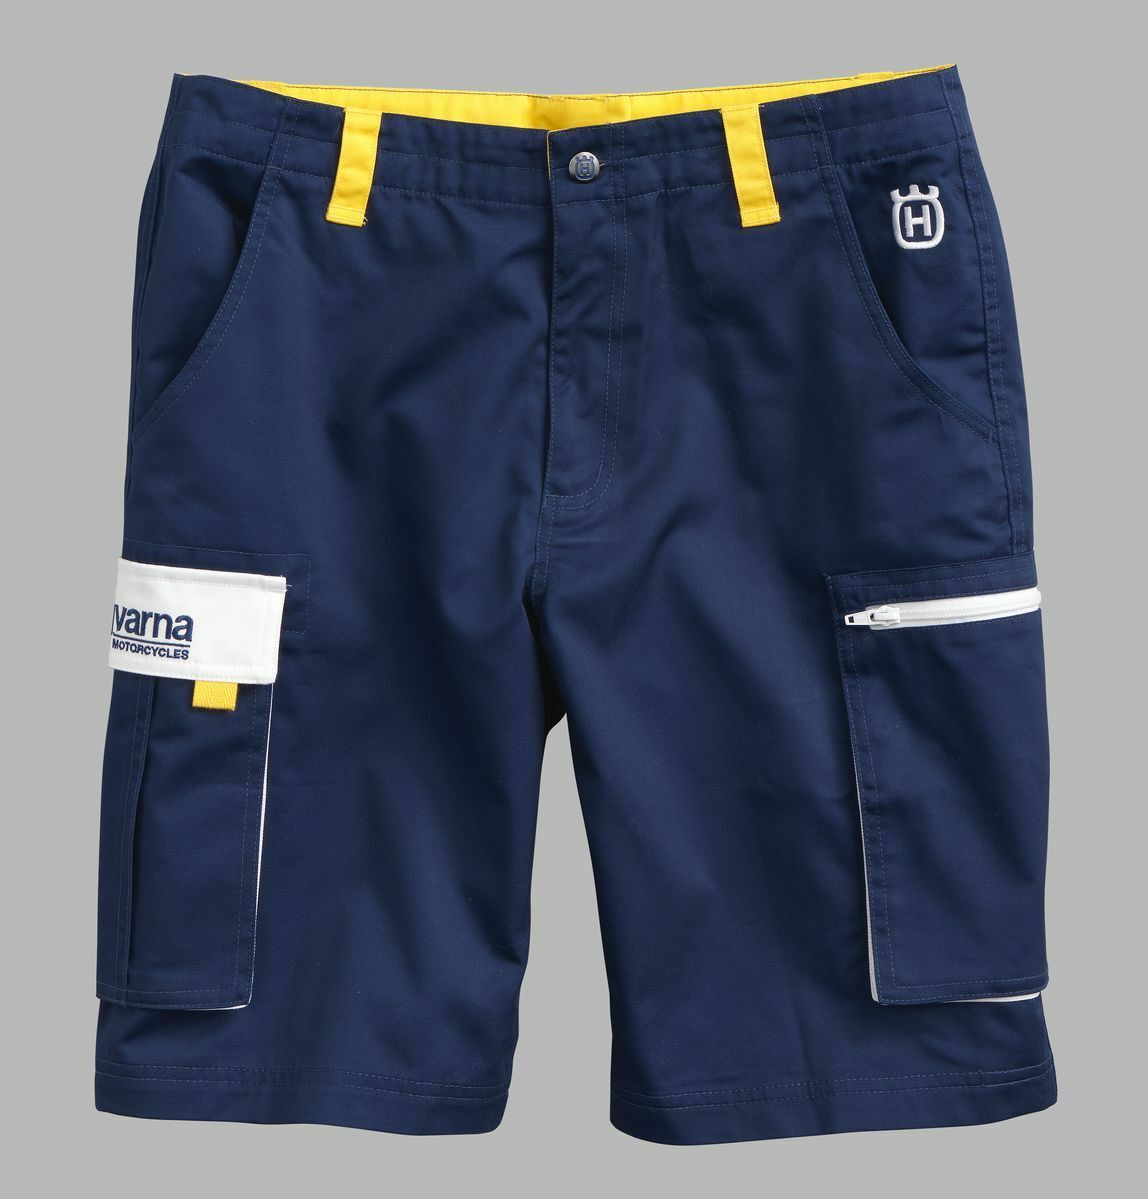 Husqvarna Team Shorts (Kurze Hose)  Casual Clothing 2018